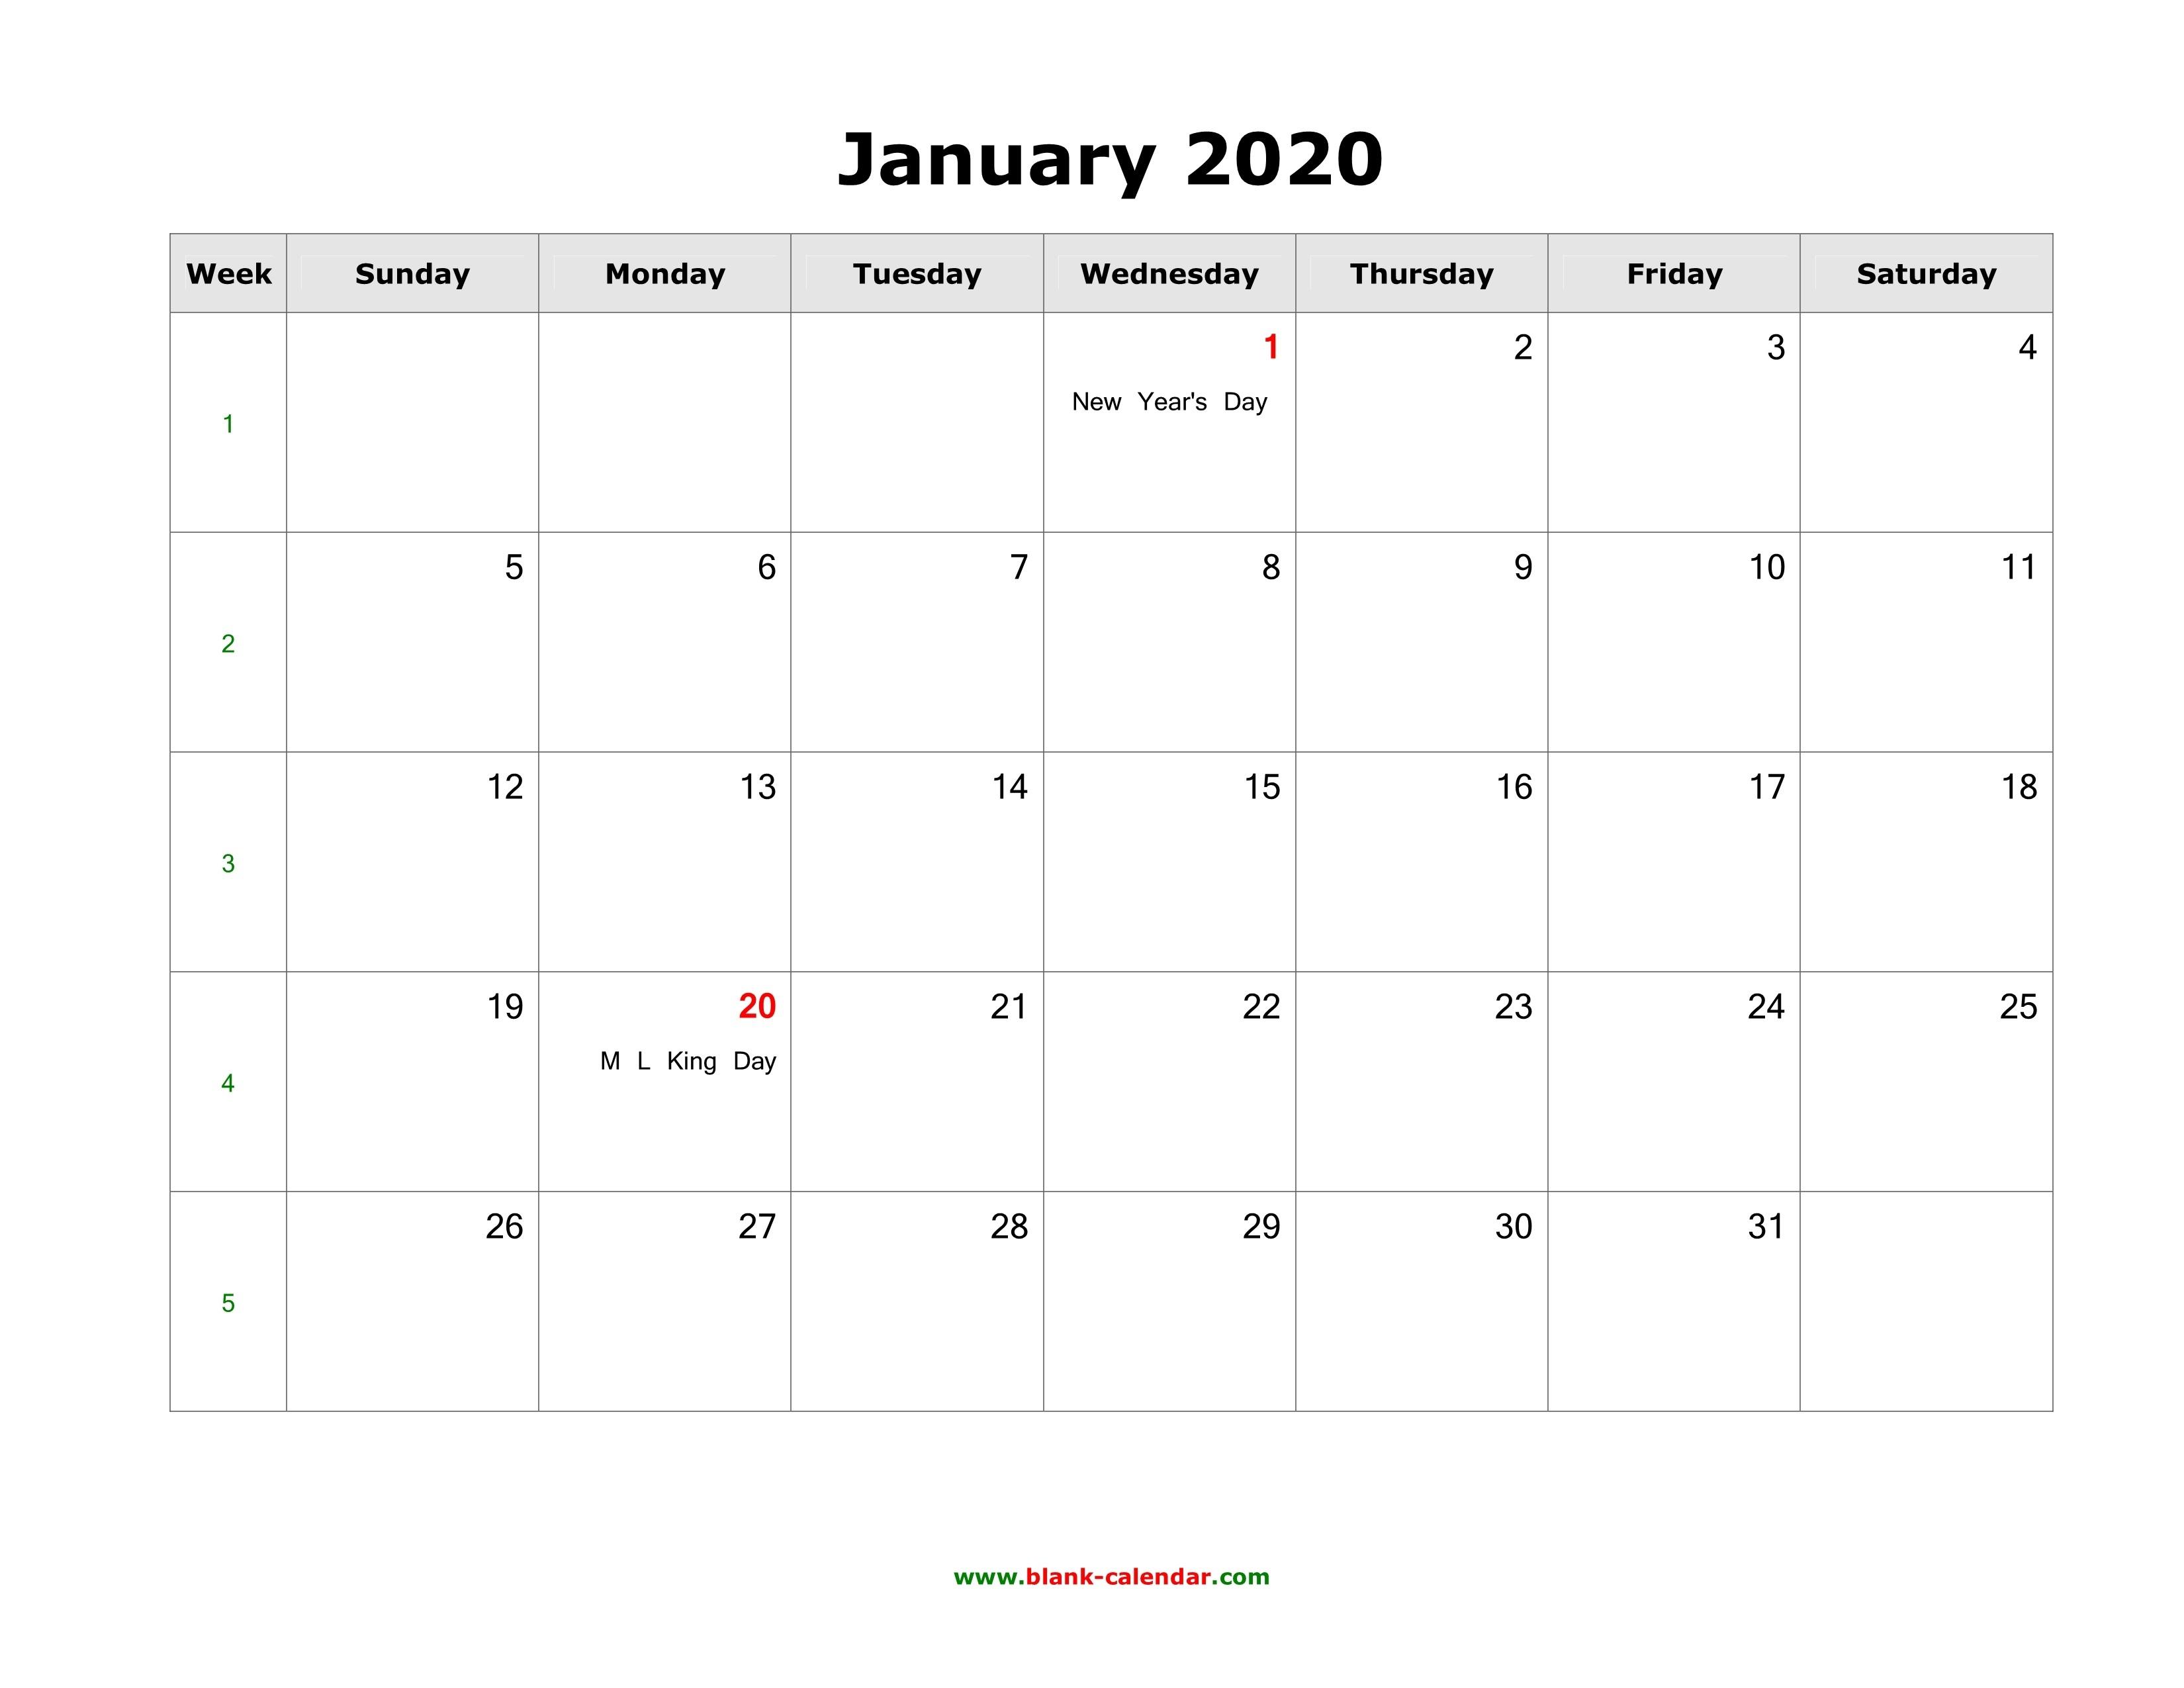 January 2020 Blank Calendar | Free Download Calendar Templates-January 2020 Calendar Template Word